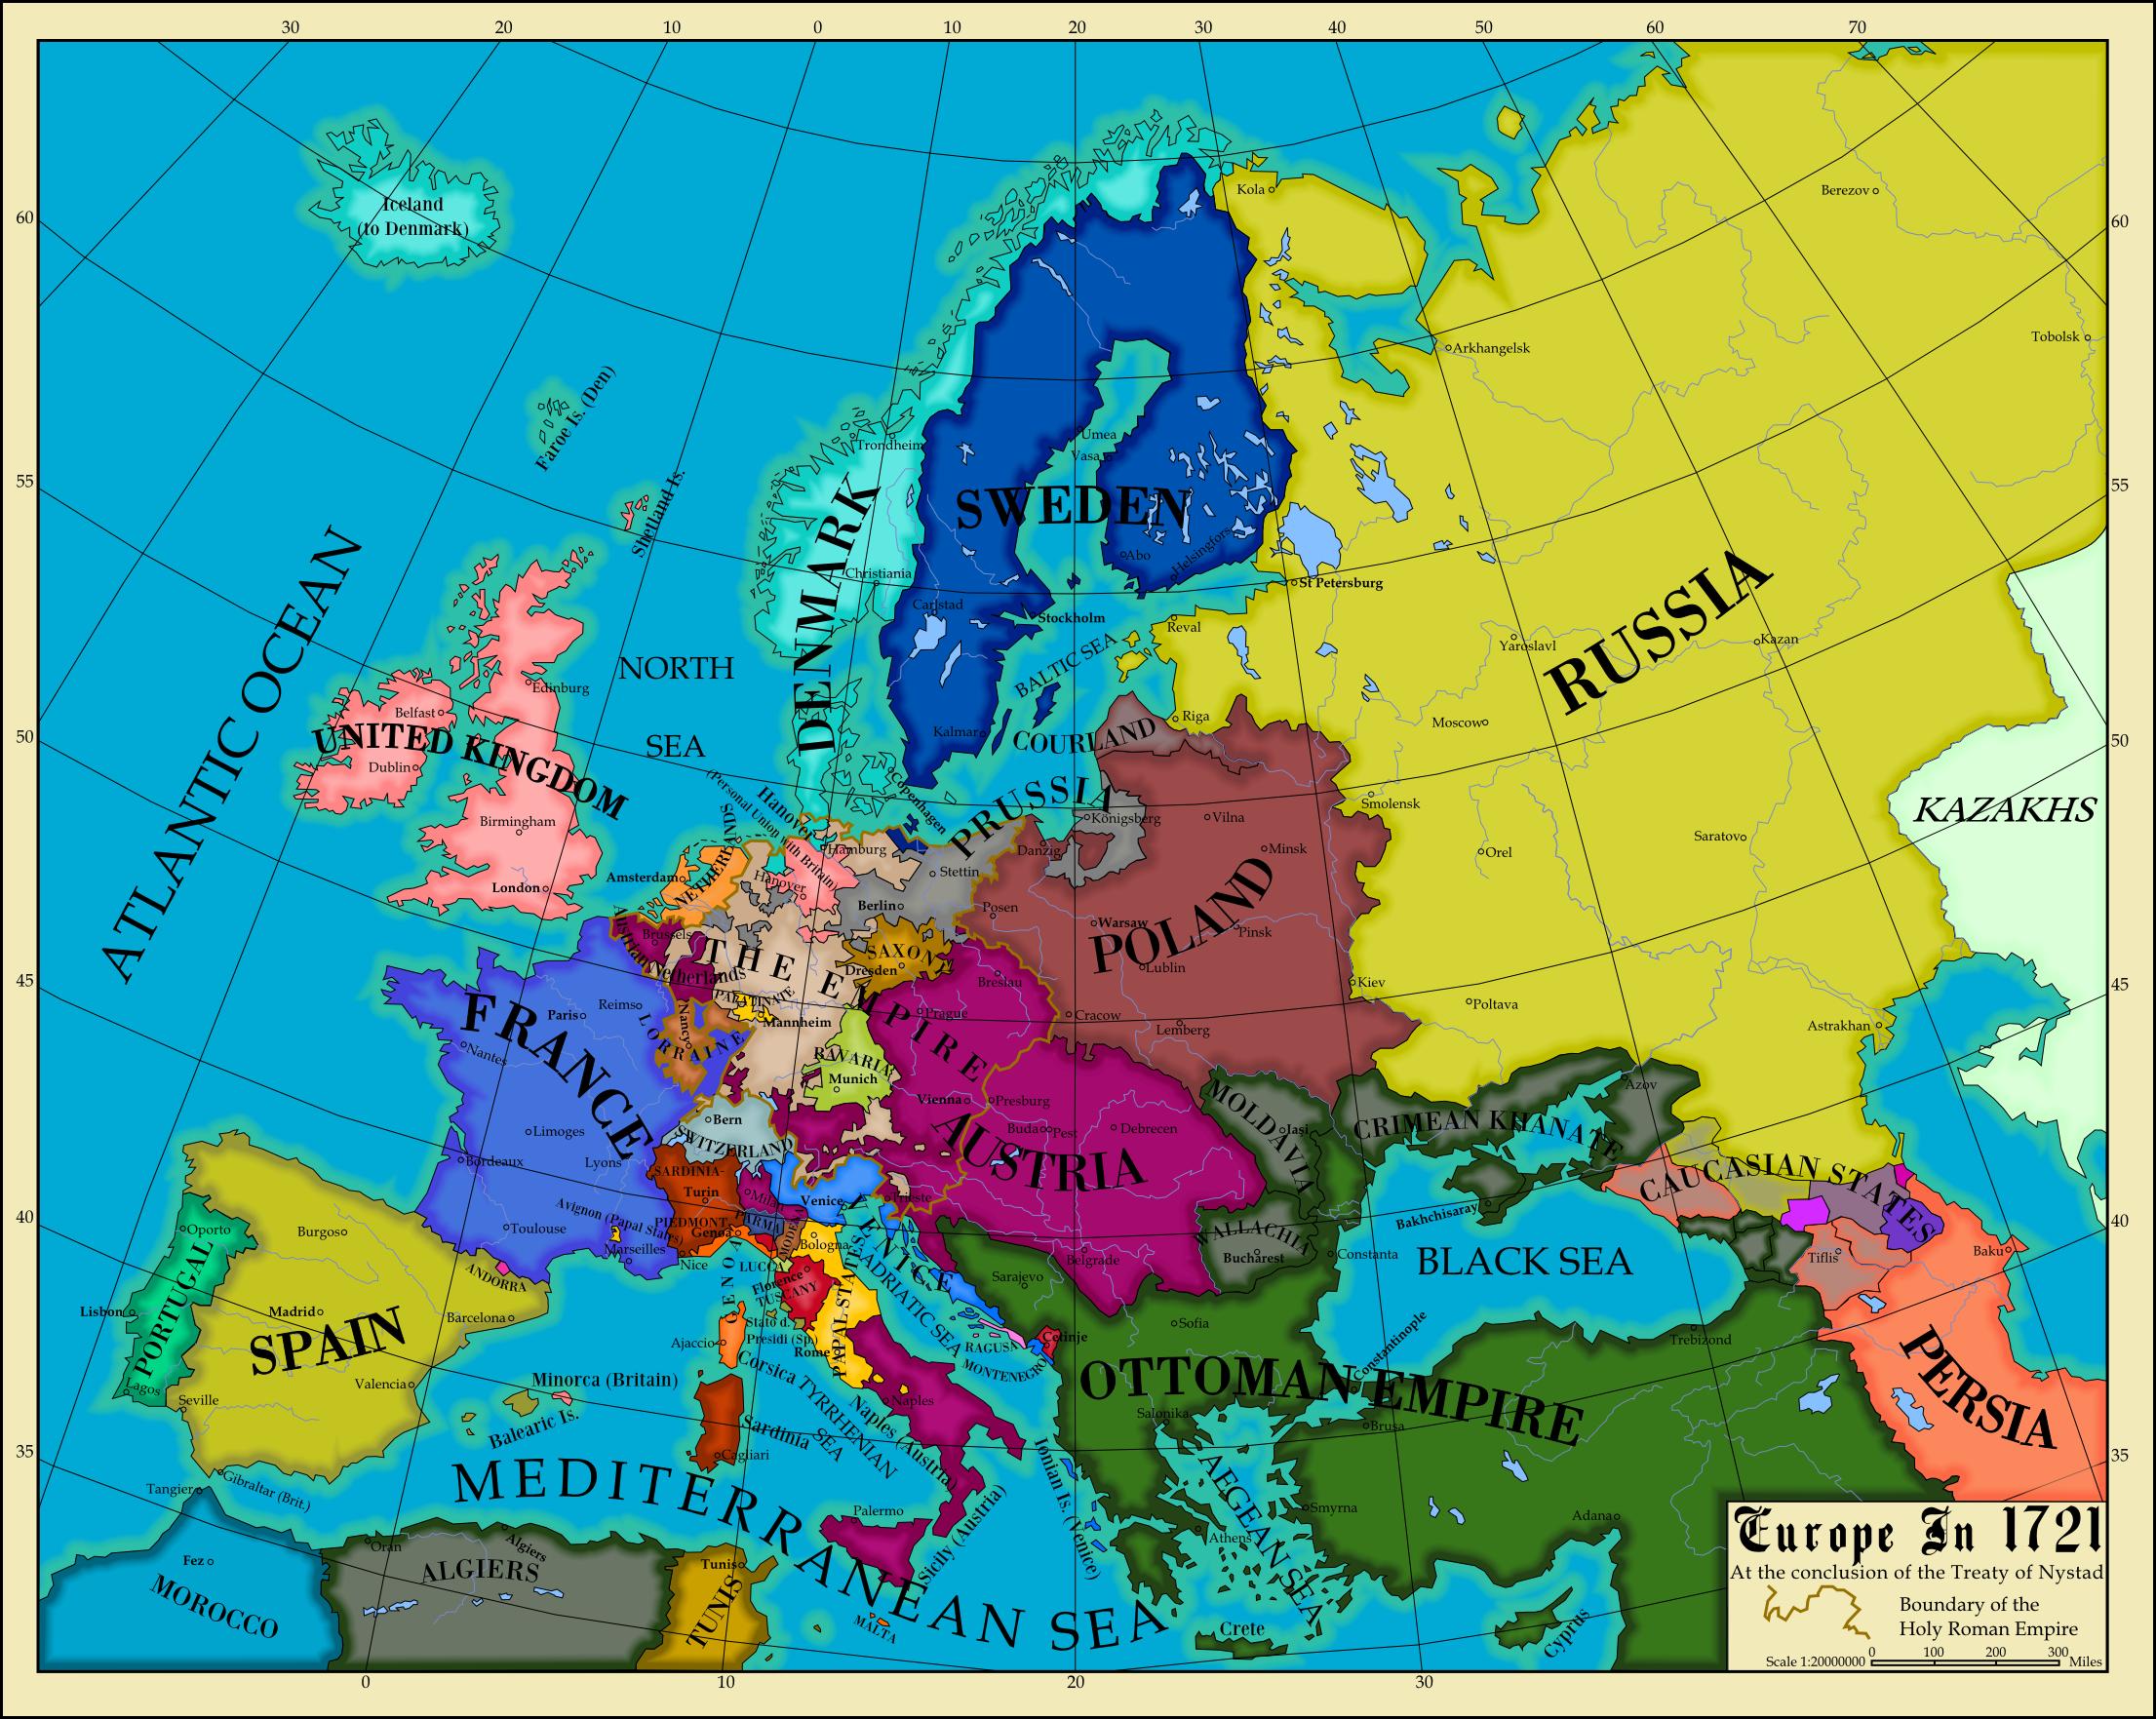 Europe By AHImperator On DeviantArt - Europe map 1648 westphalia